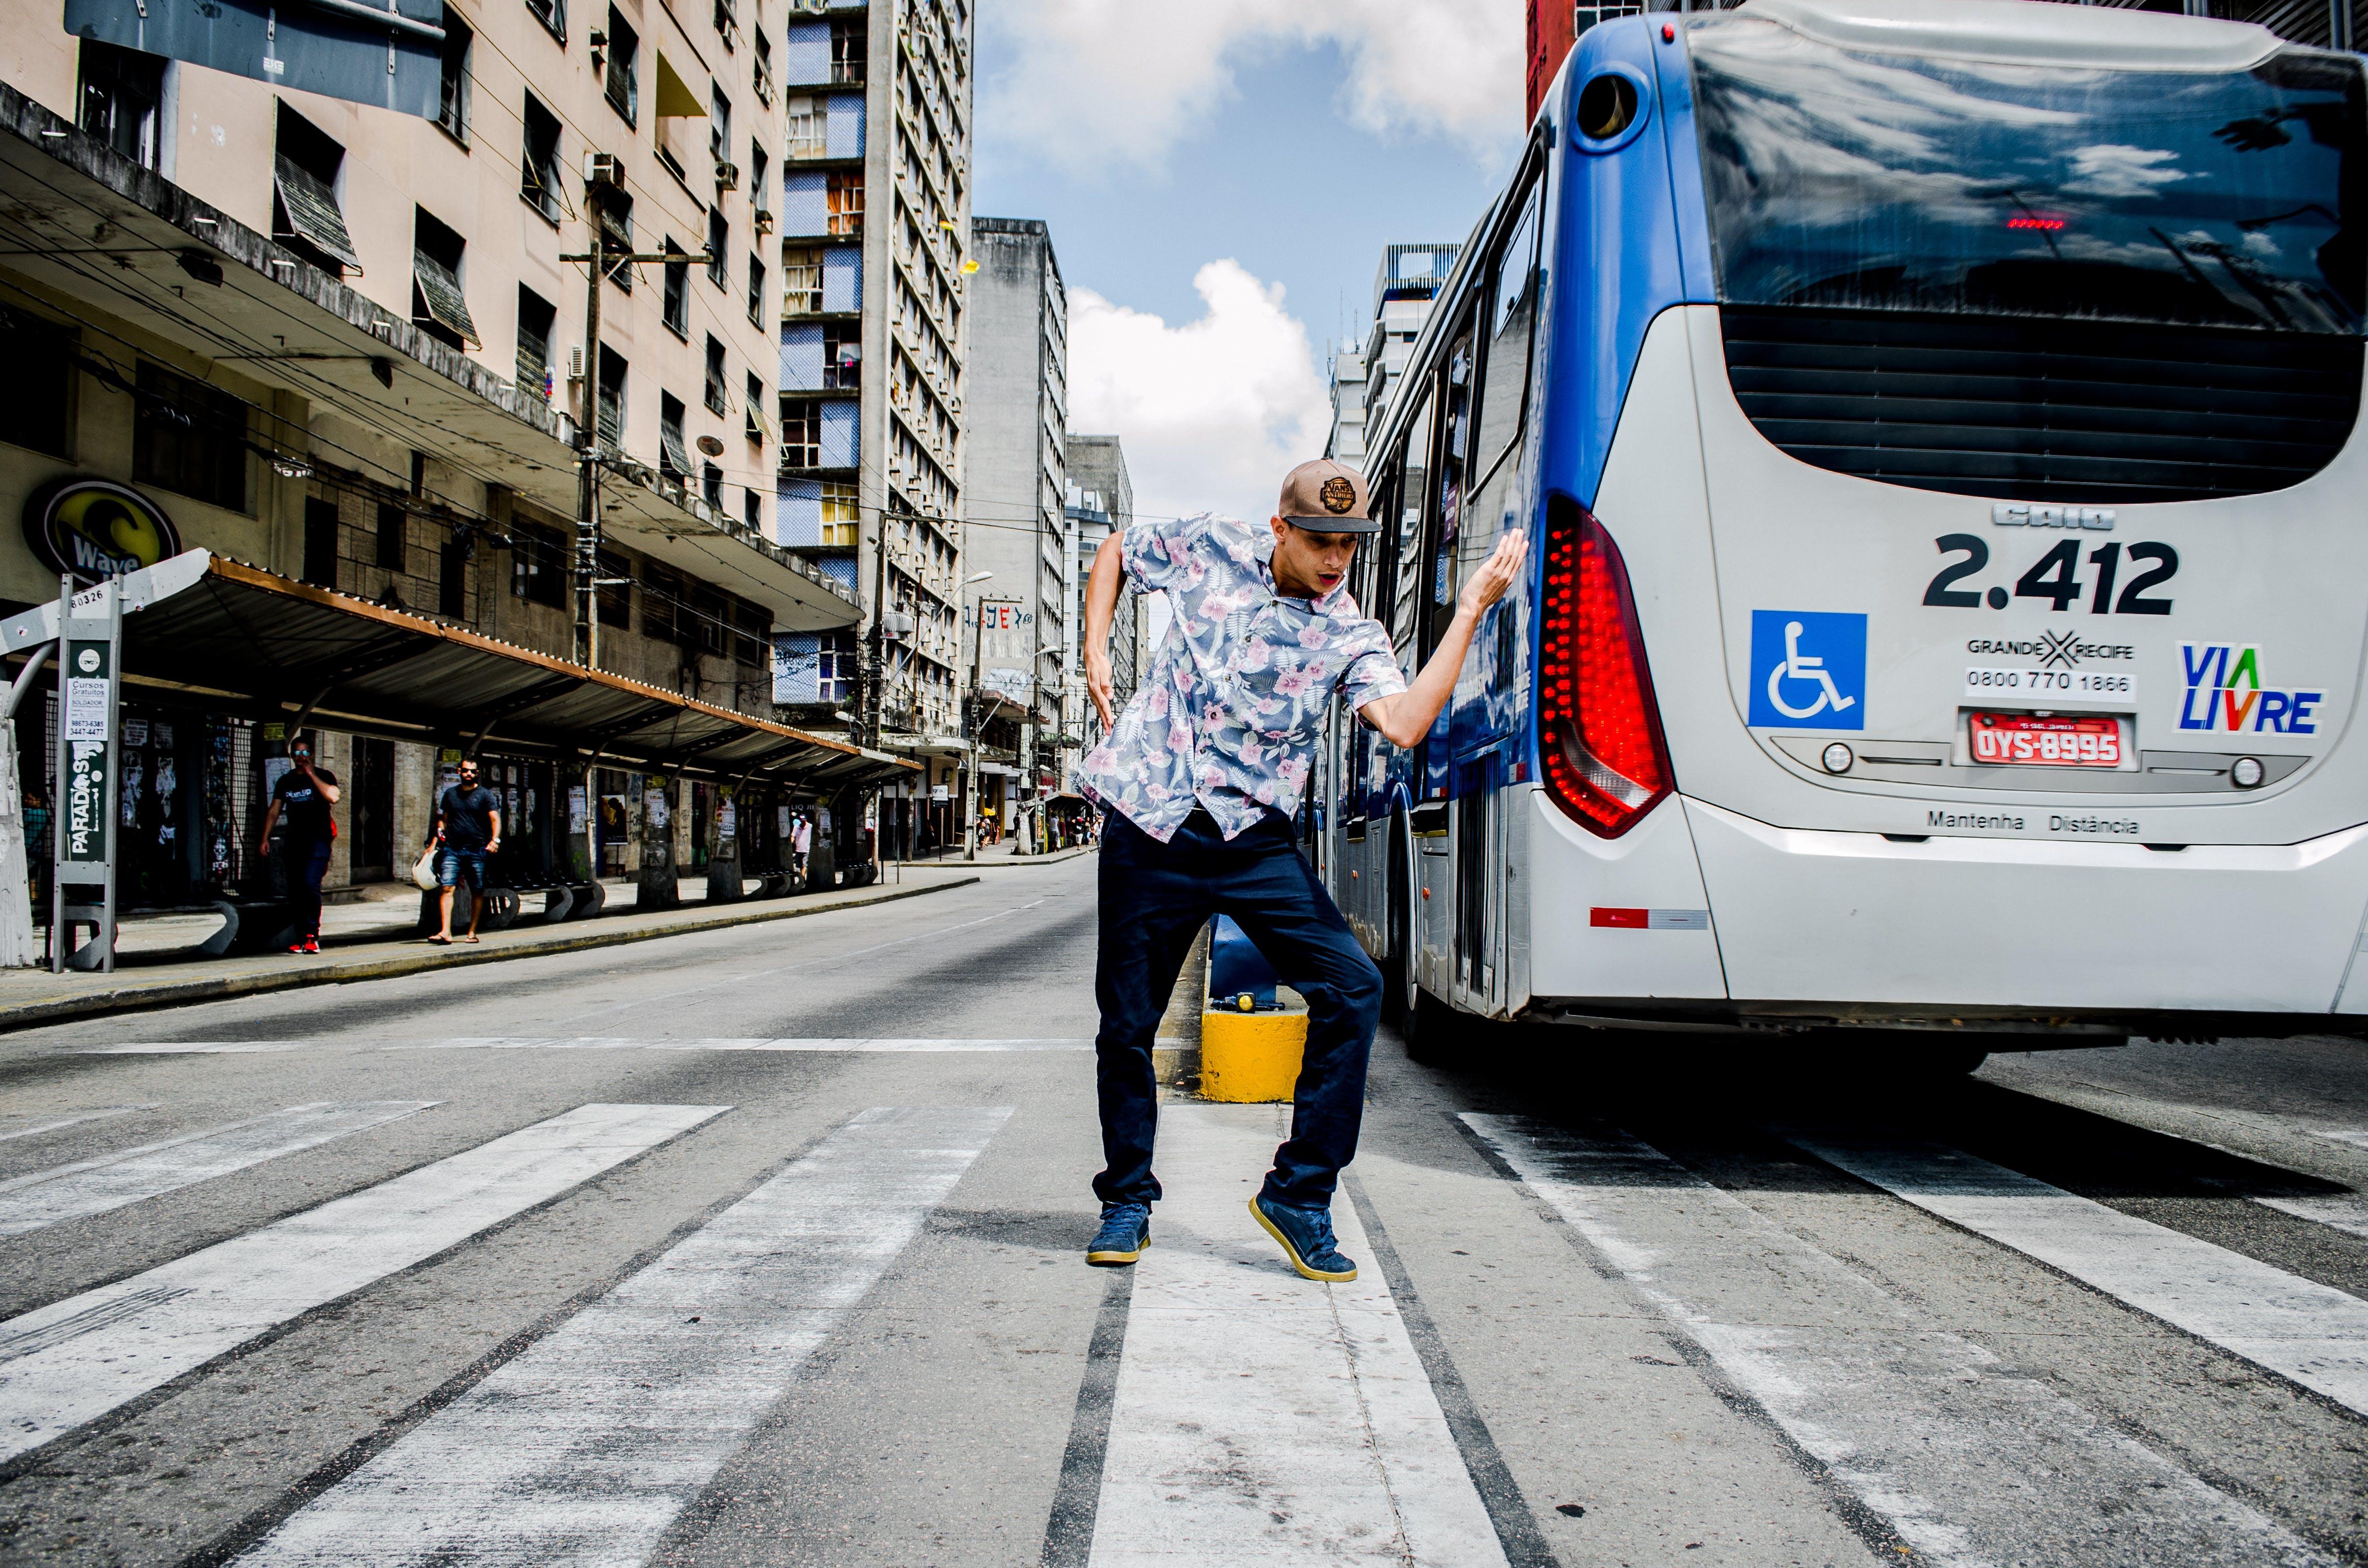 Man Dancing on Pedestrian Crossing Near Bus